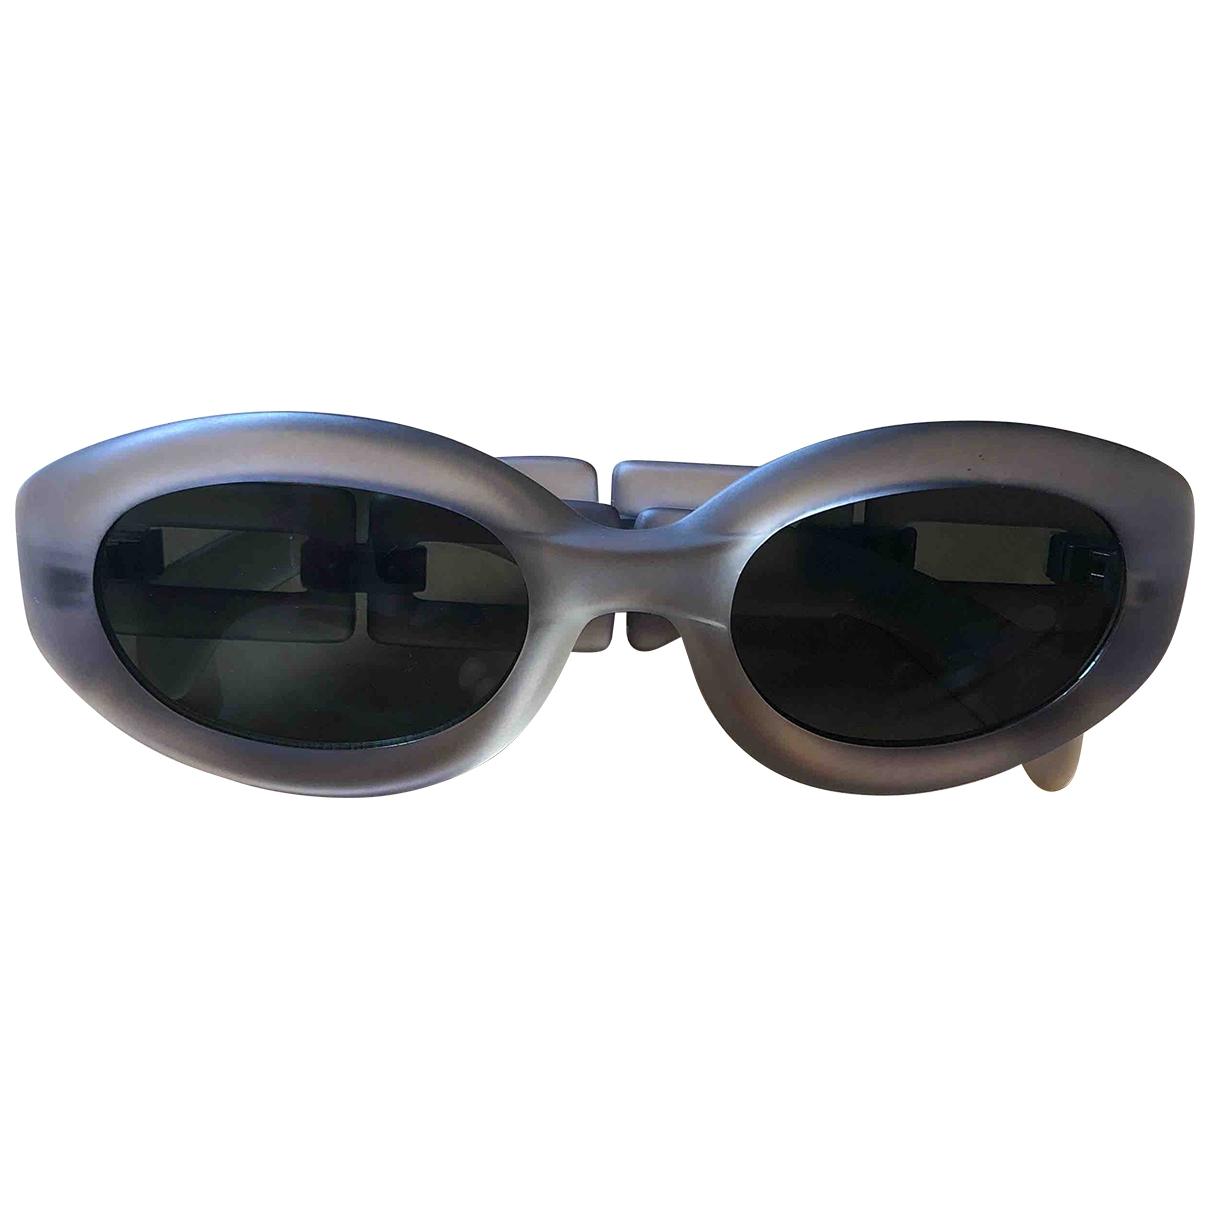 Karl Lagerfeld \N Grey Sunglasses for Women \N